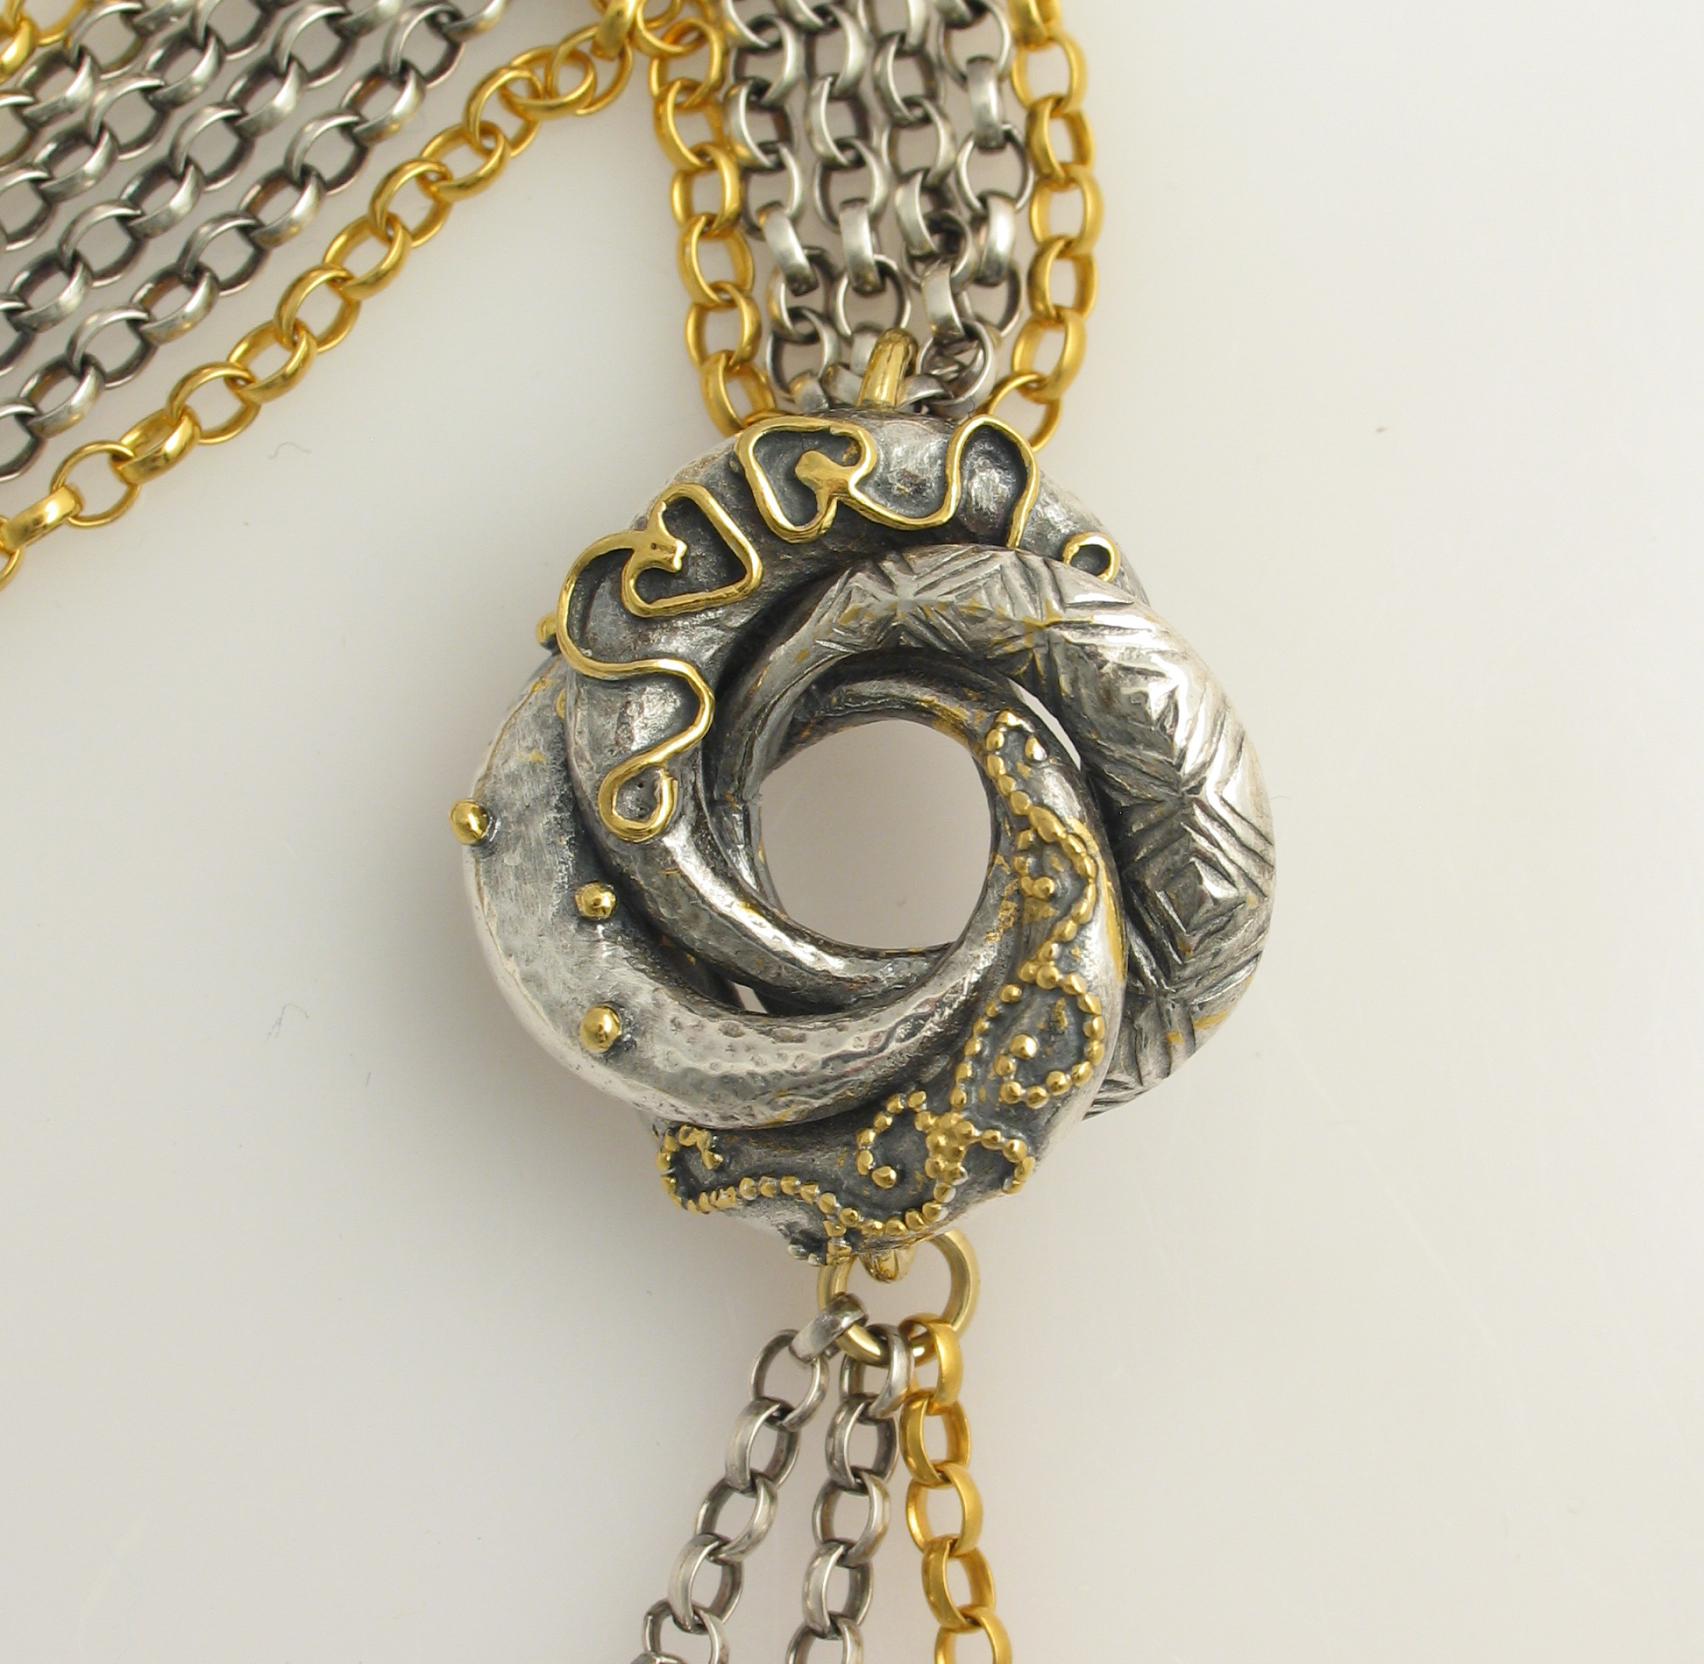 Algerian Love Knot Necklace Contemporary Necklaces